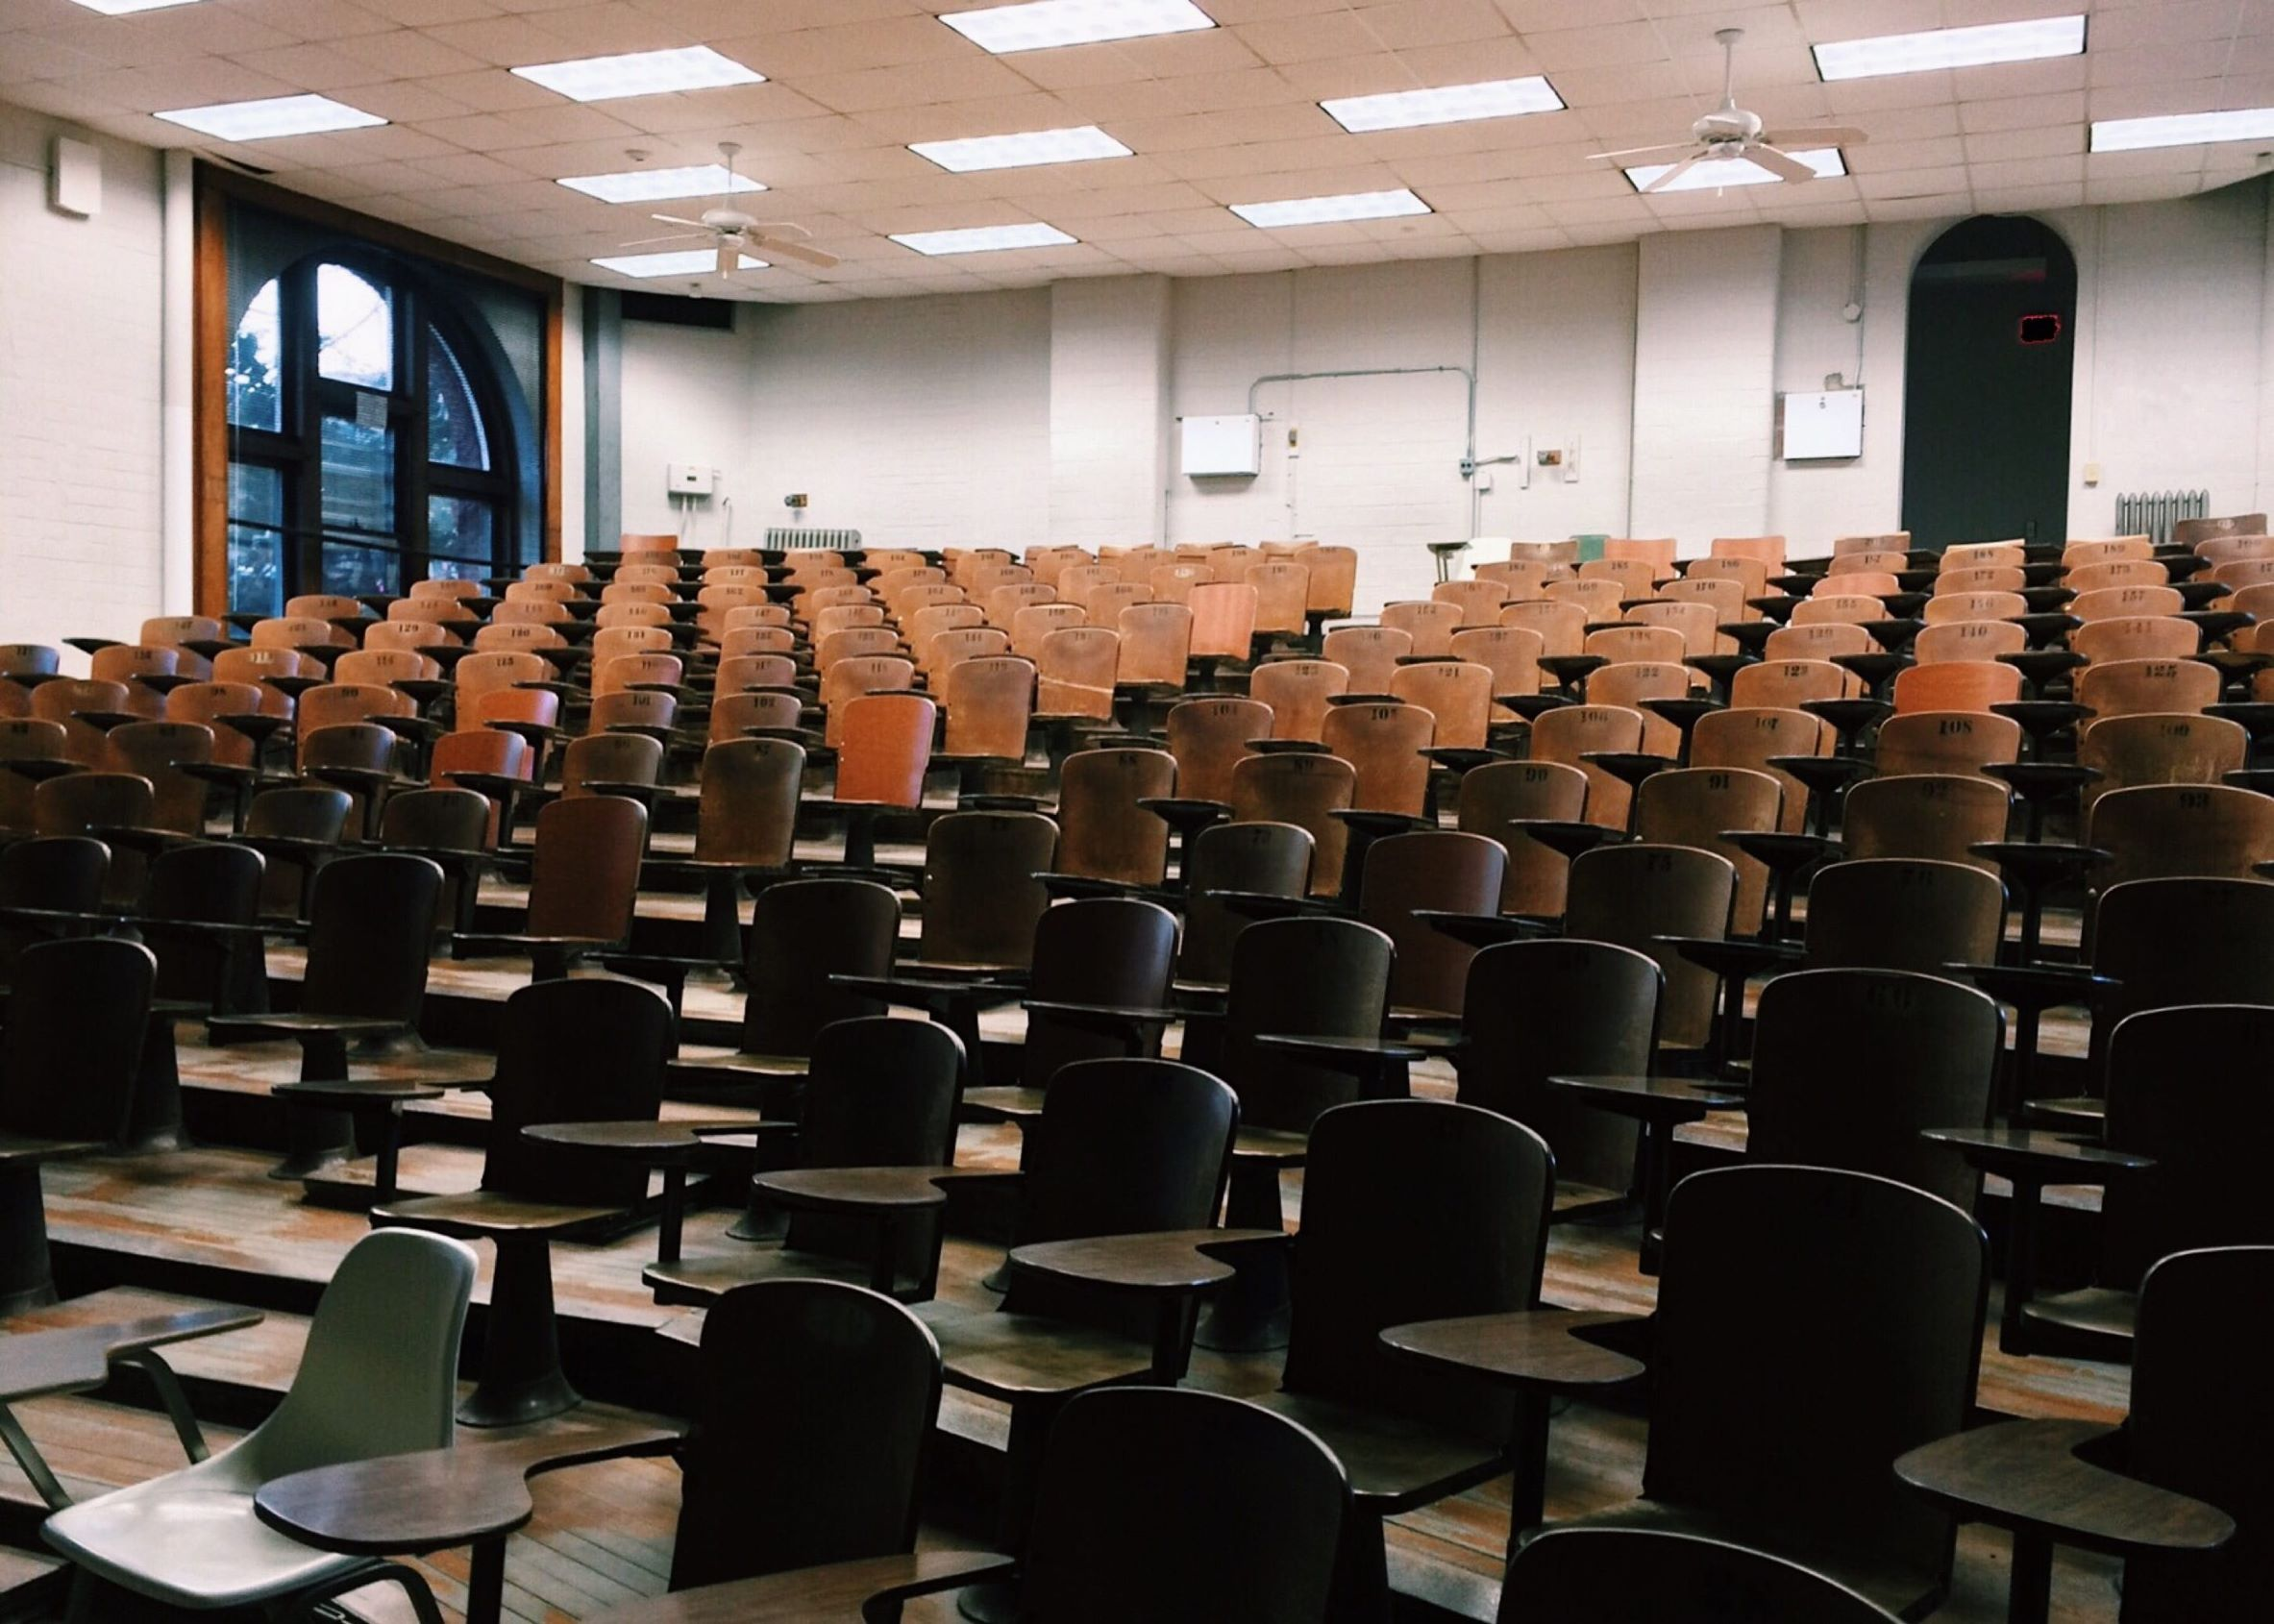 Collège (Symbolbild)